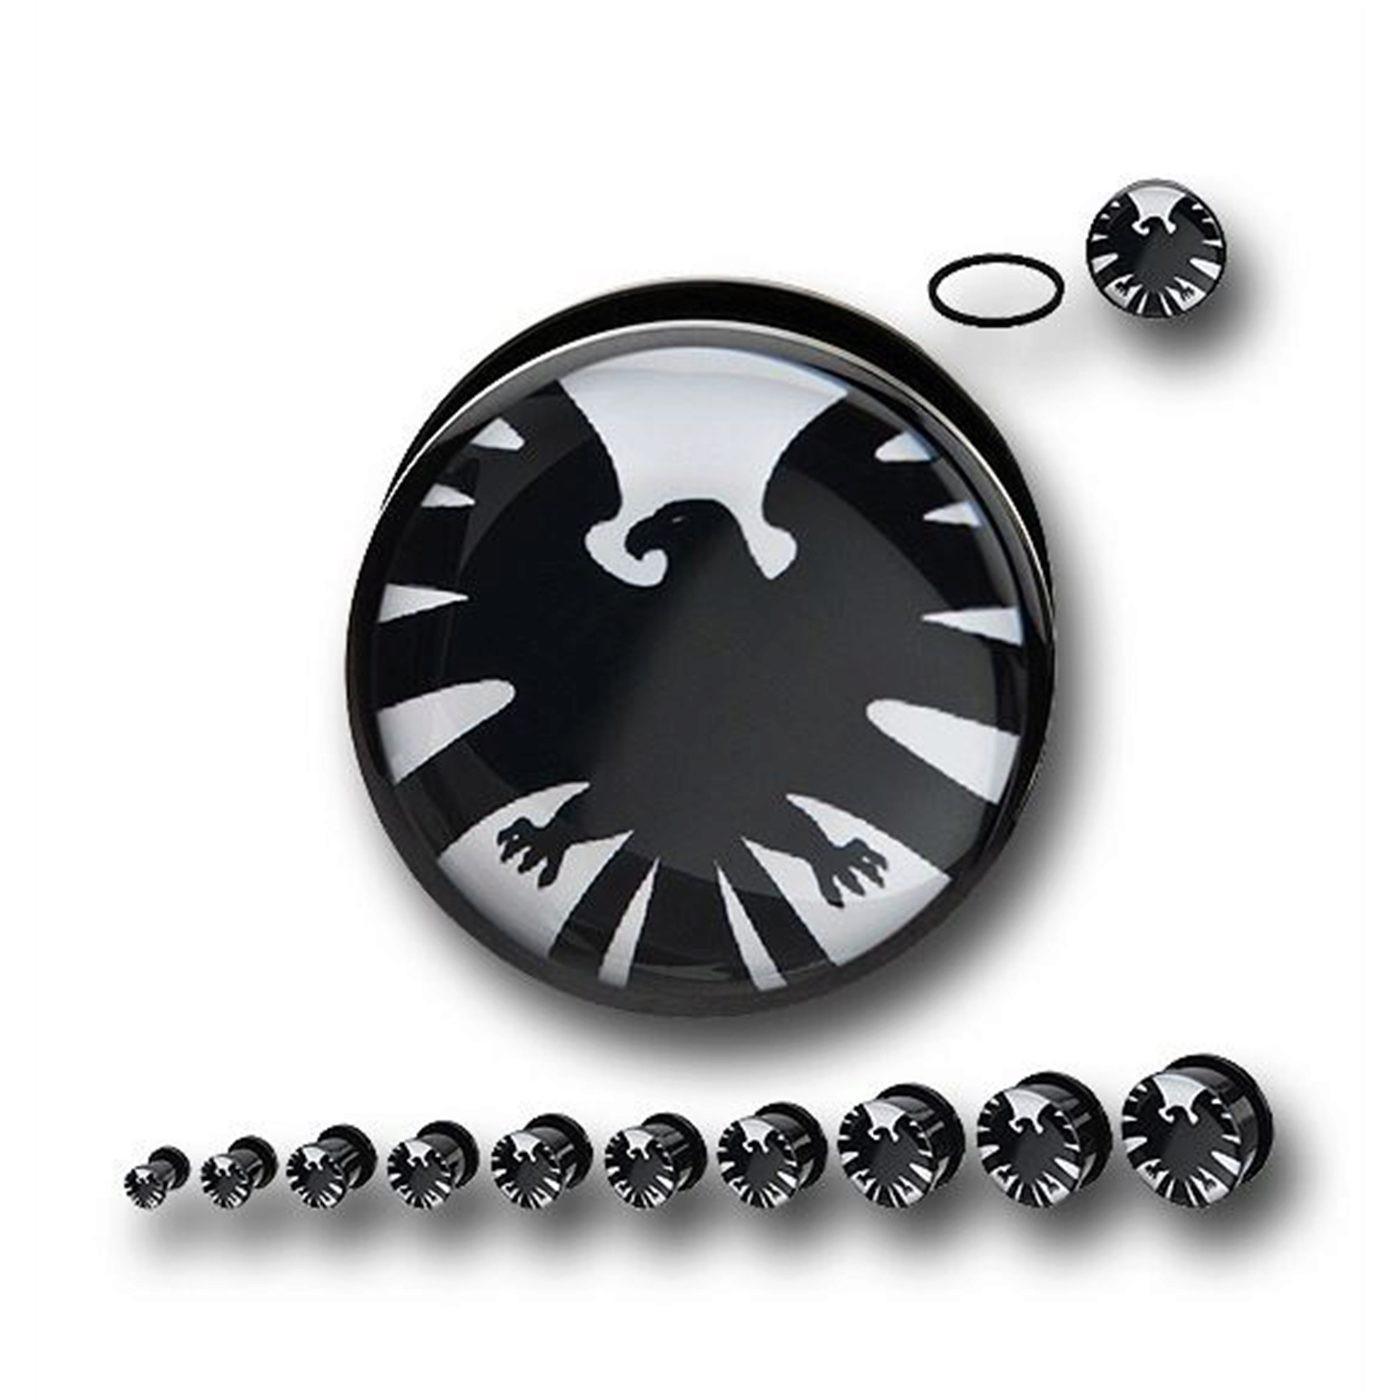 SHIELD Symbol Acrylic Screw Fit Plugs